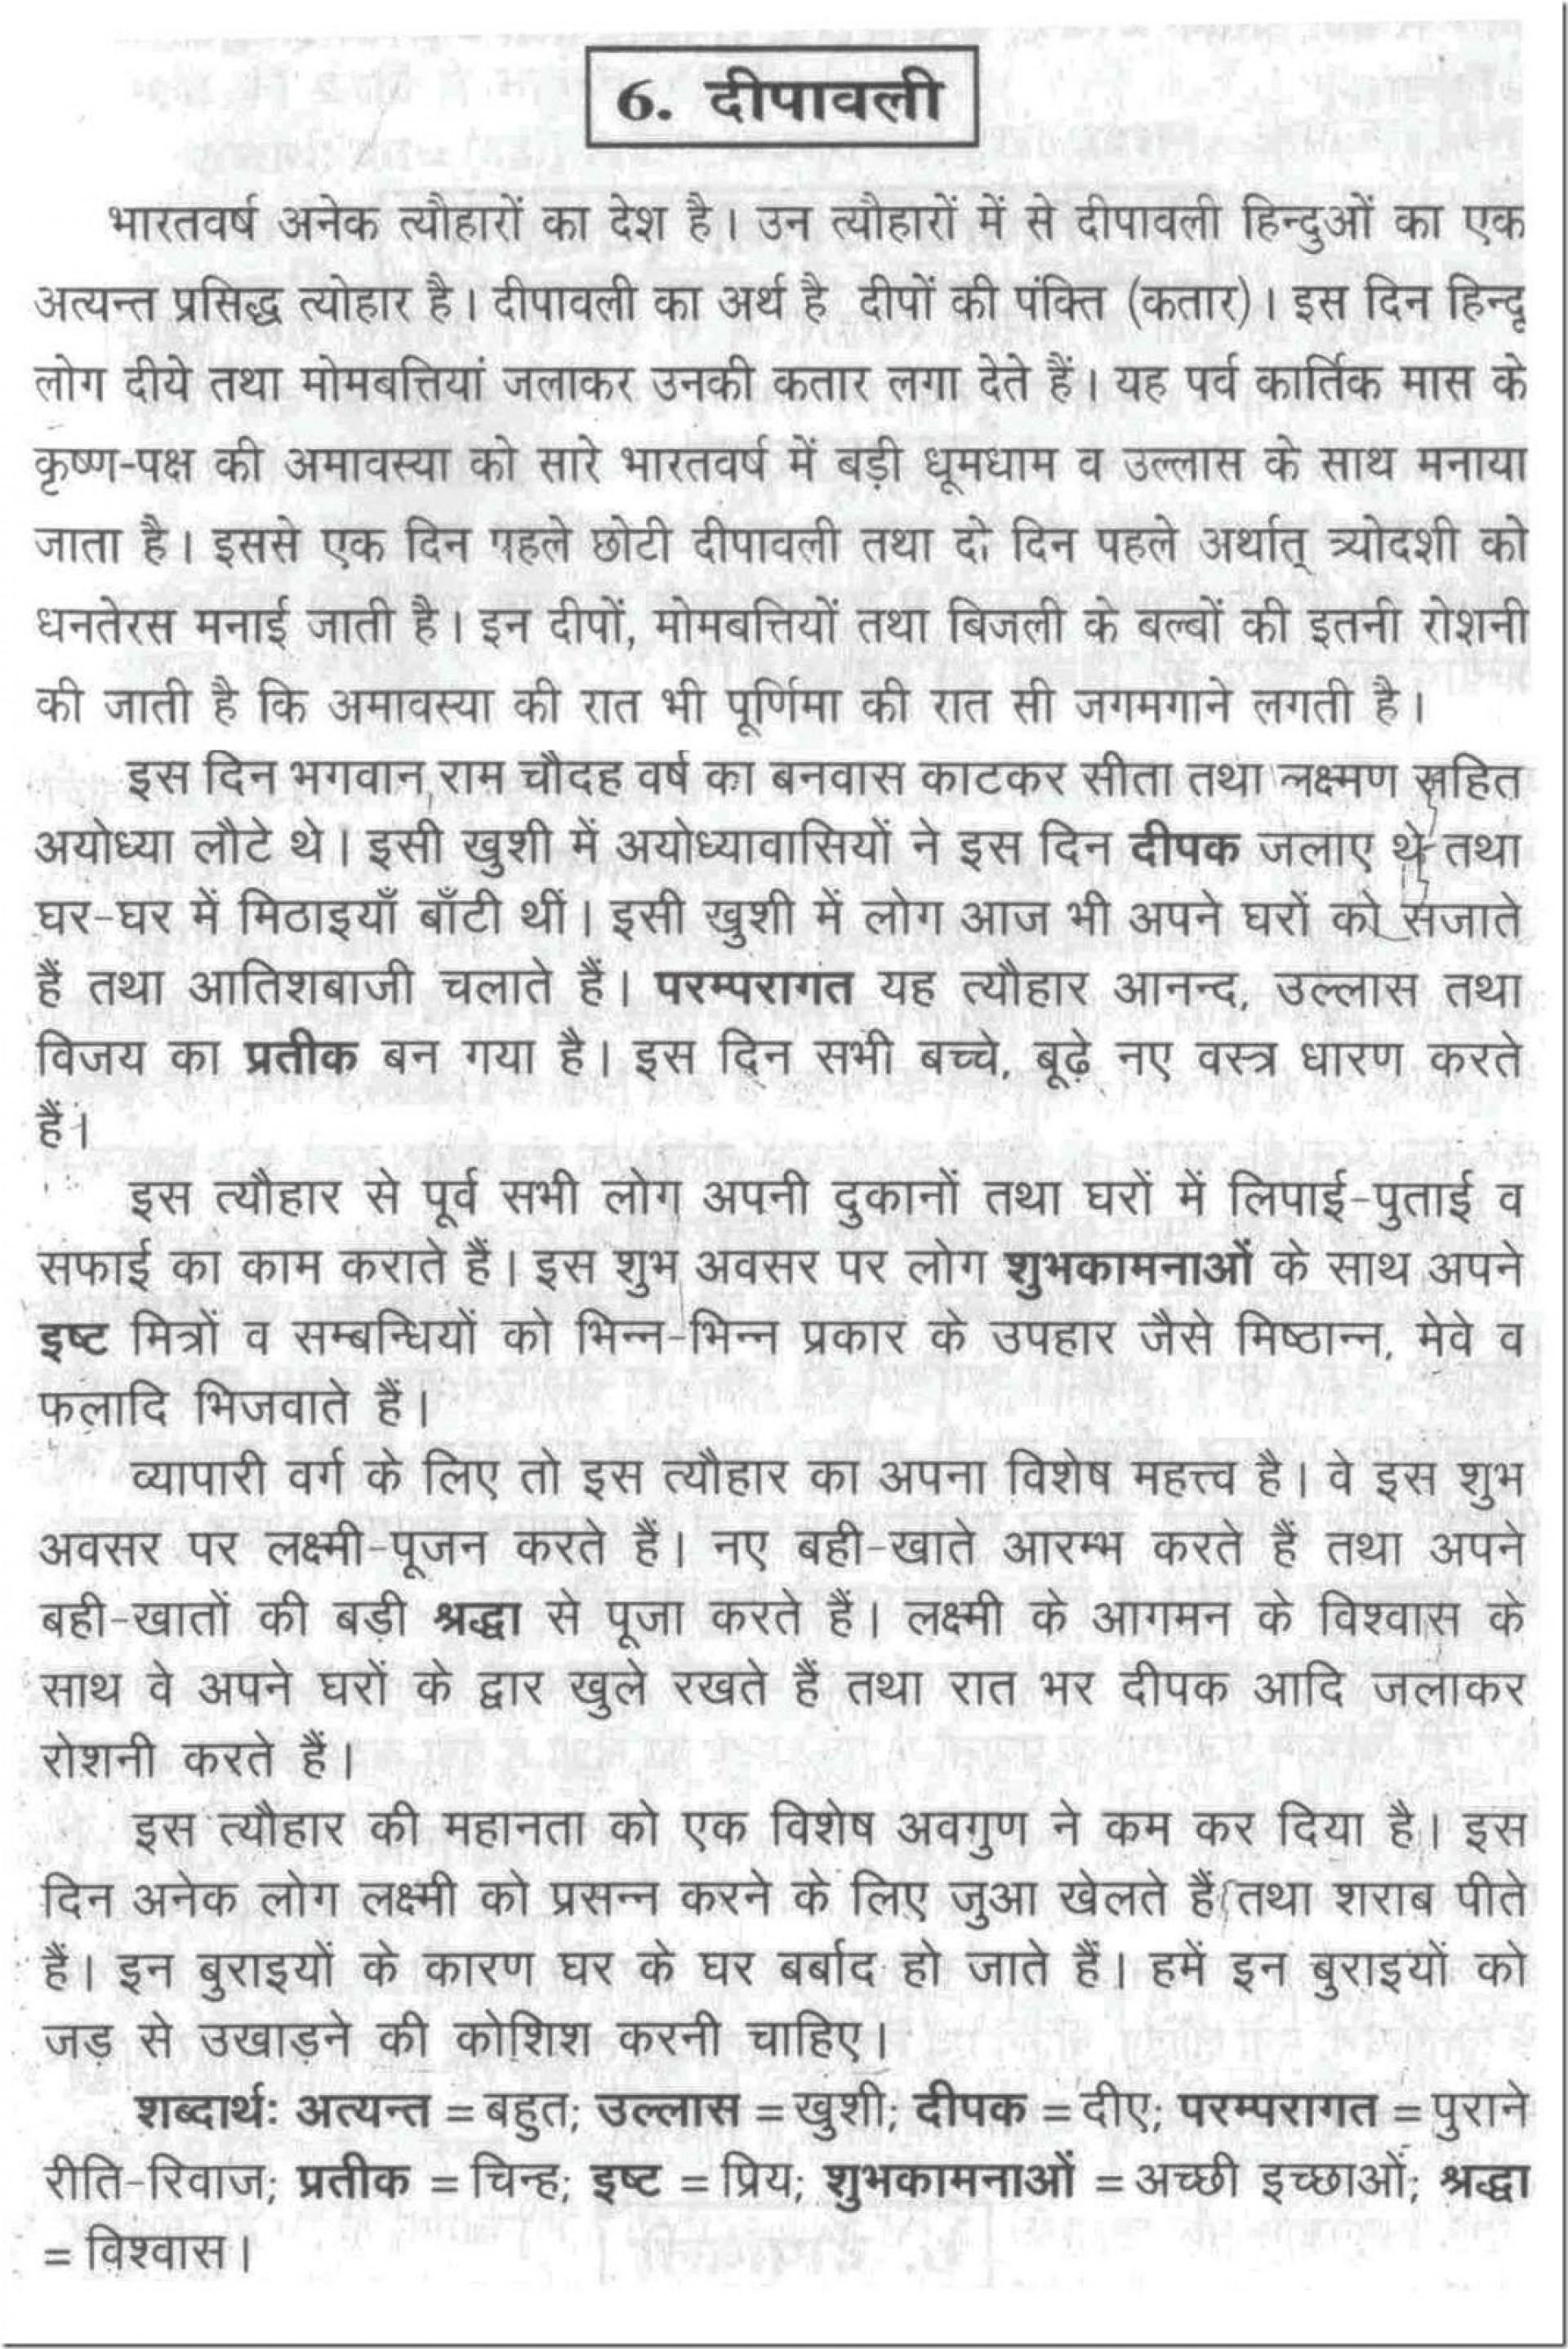 004 2bdiwali2bfestival2bessay2bin2bhindi2b2b252812529 Essay For Diwali In Hindi Fantastic On 50 Words Class Short 3 1920